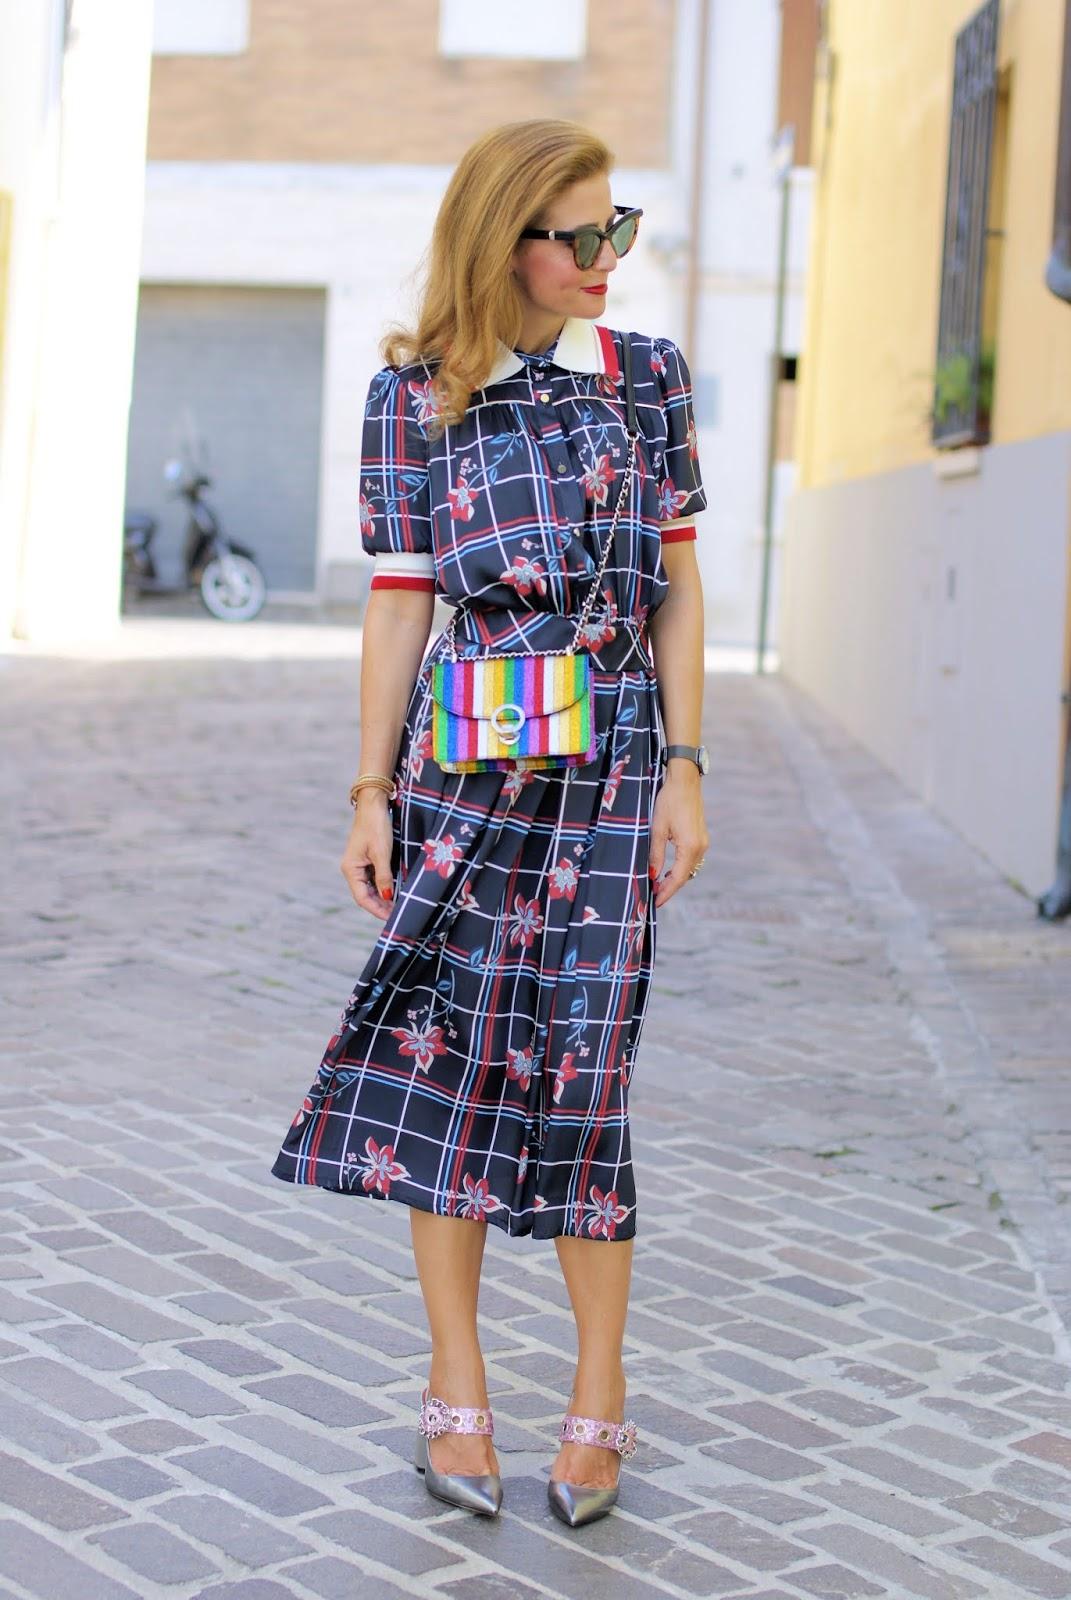 Miu Miu style white collar dress and Giancarlo Paoli shoes on Fashion and Cookies fashion blog, fashion blogger style